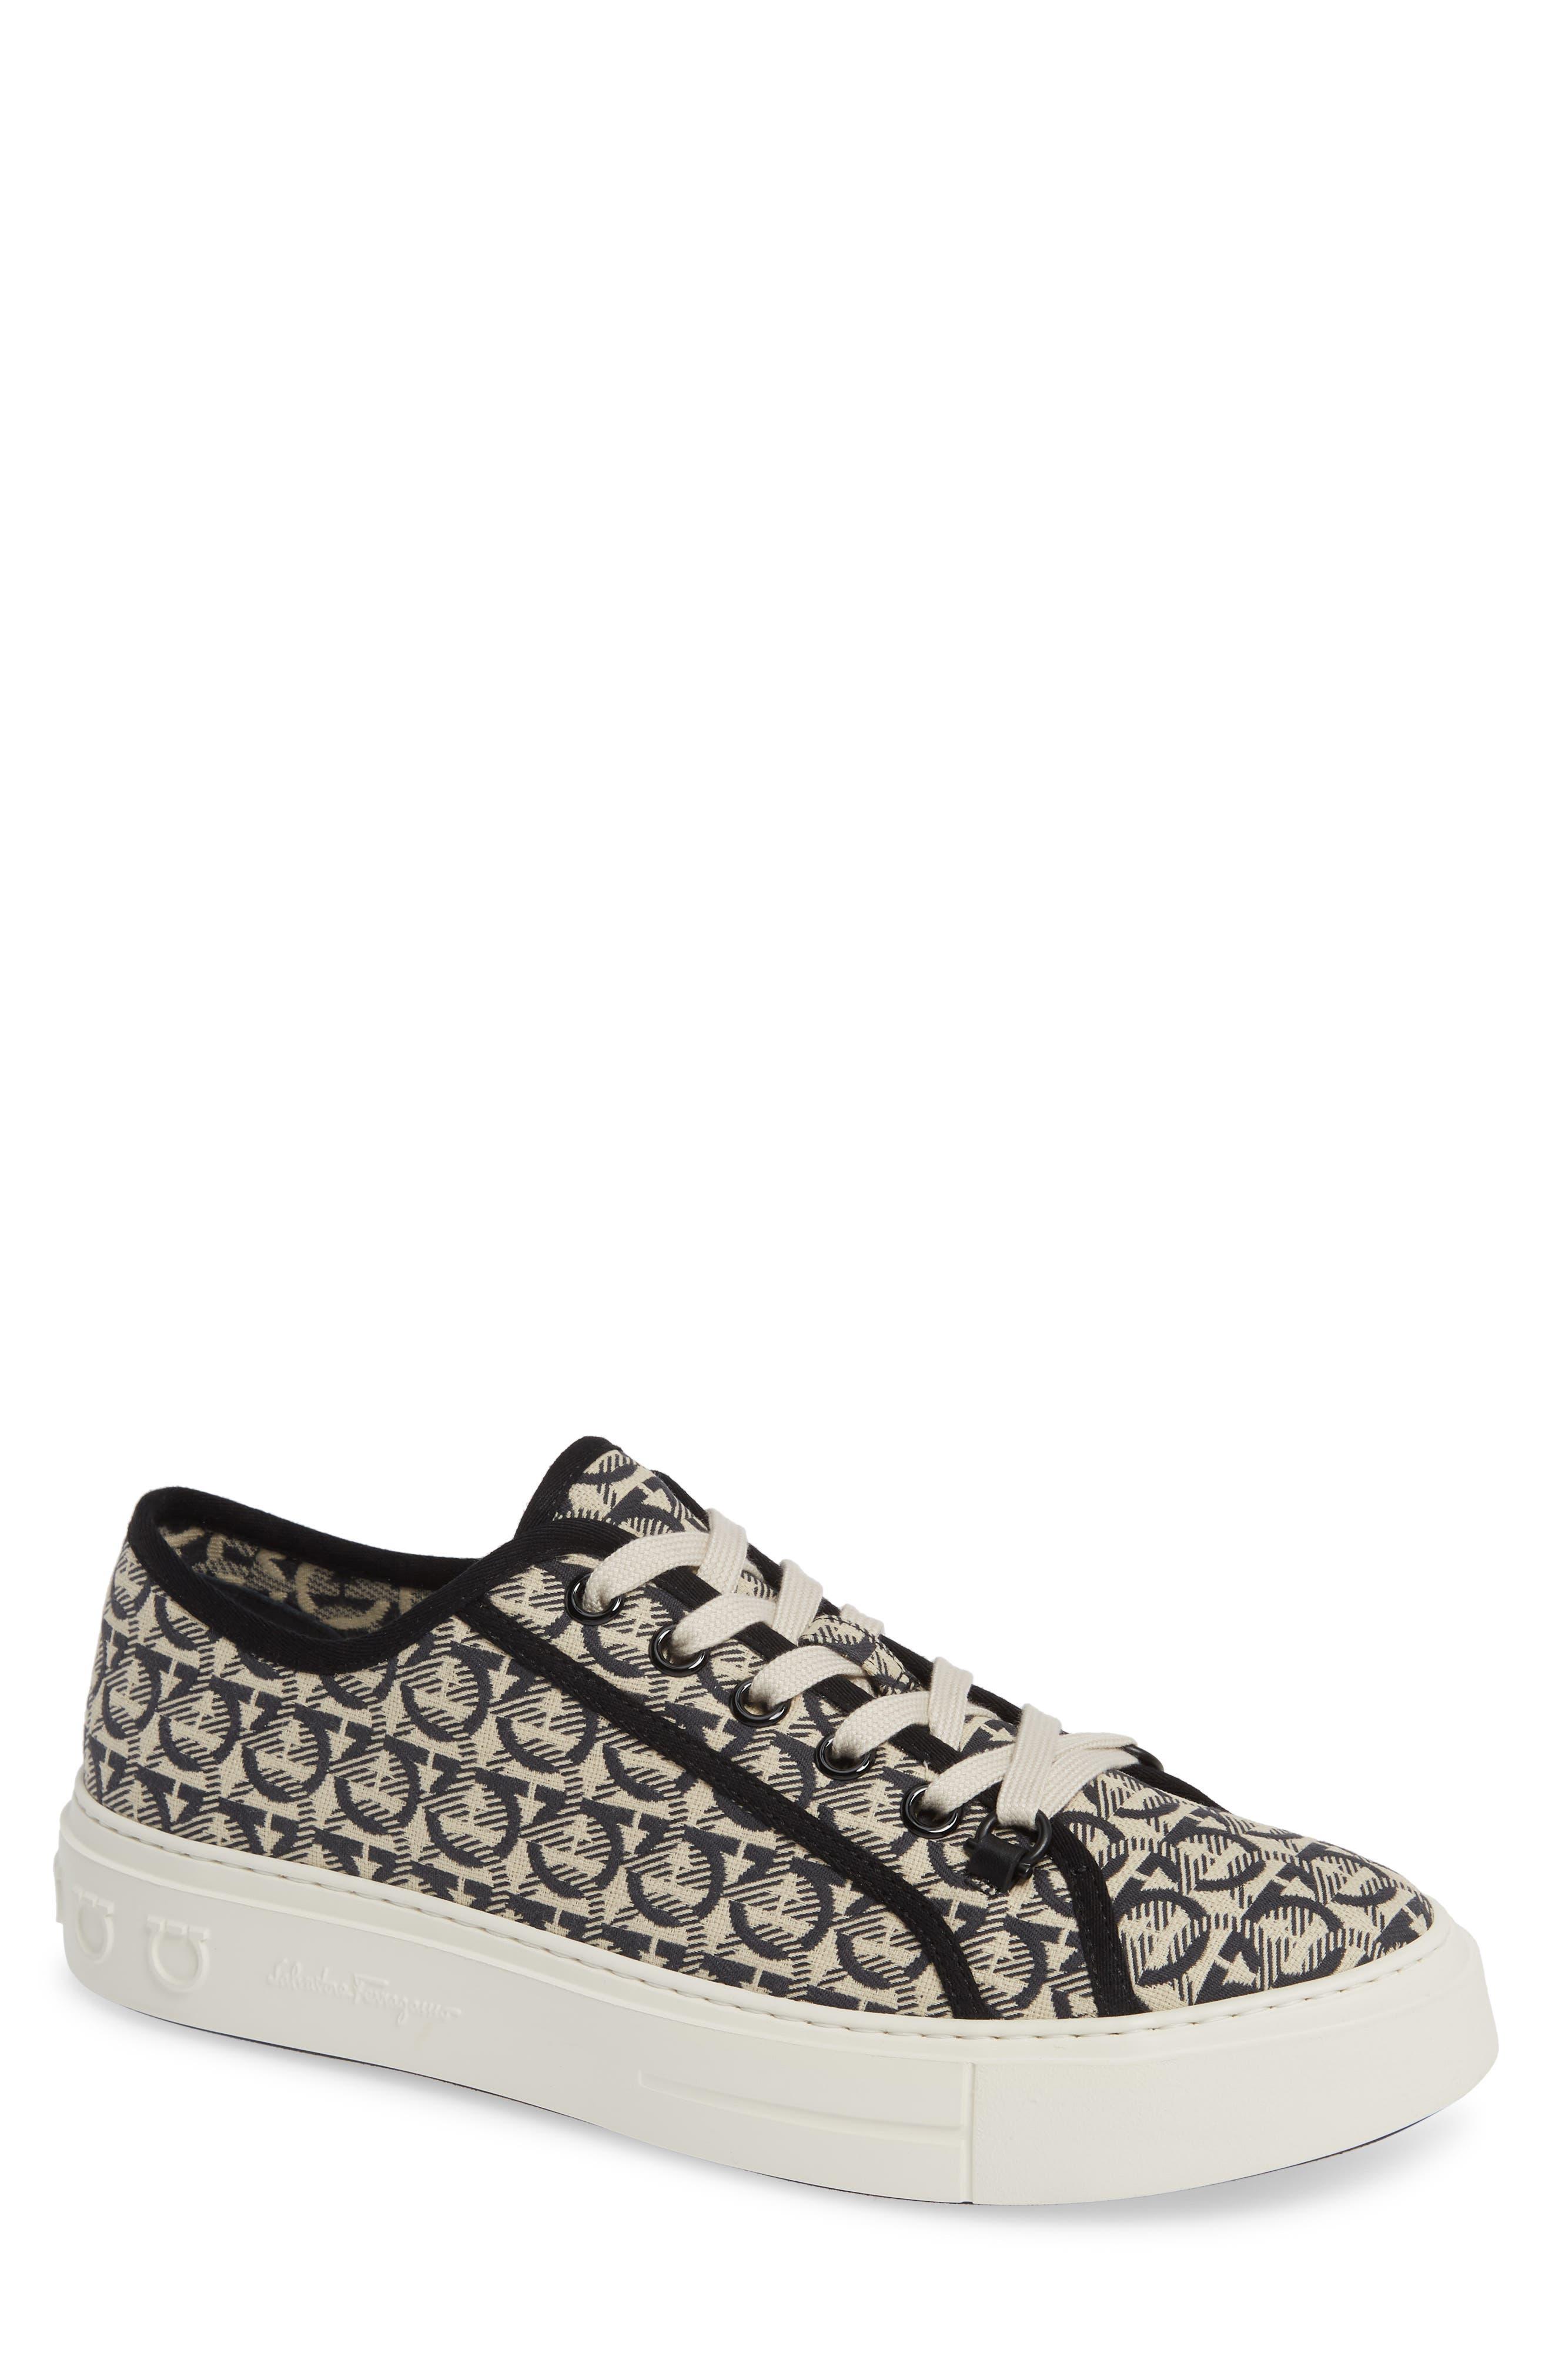 Anson Sneaker,                             Main thumbnail 1, color,                             BEIGE/NERO